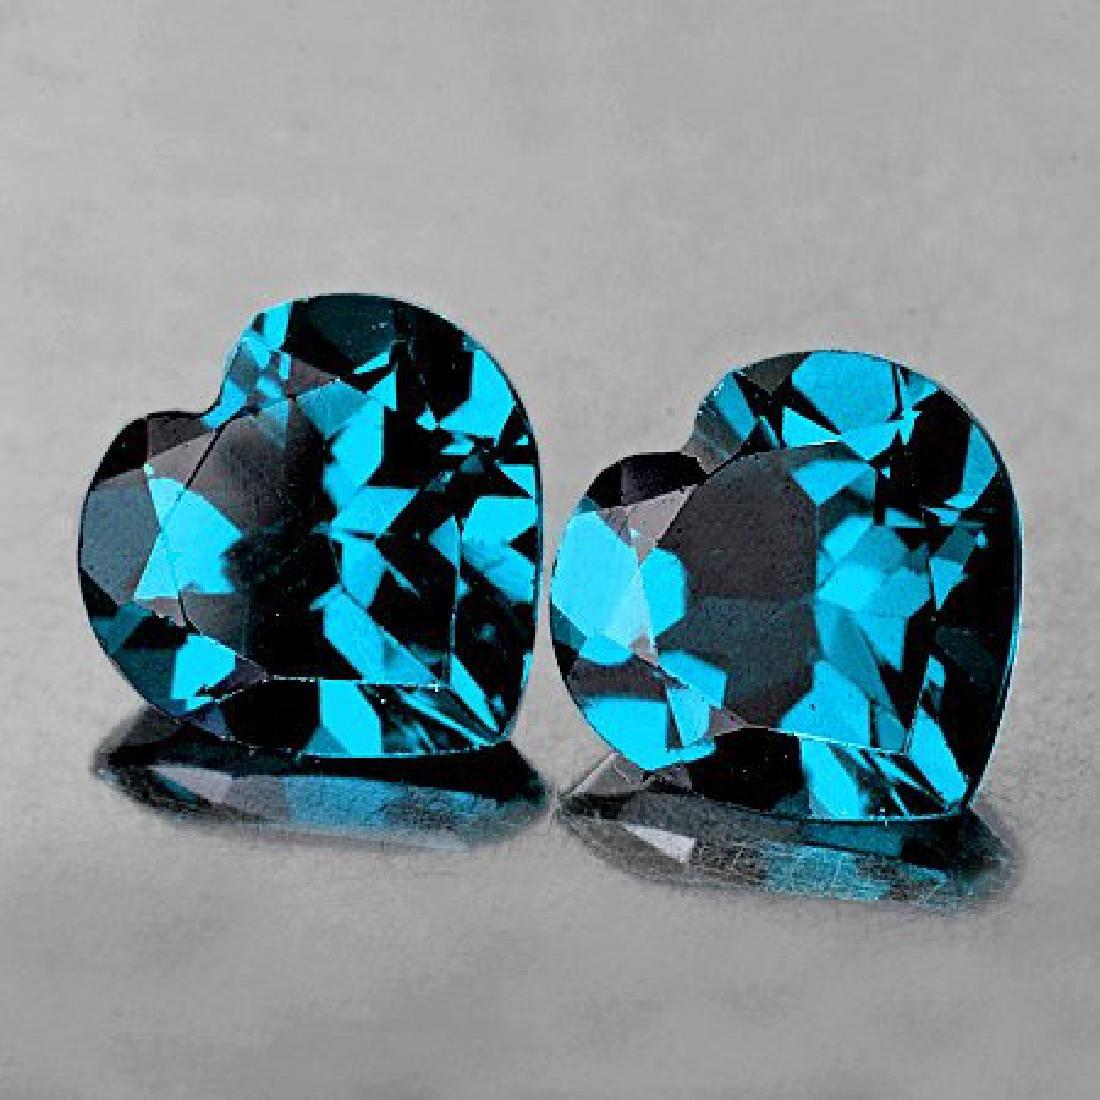 Natural London Blue Topaz Heart Pair 7.00 mm Flawless